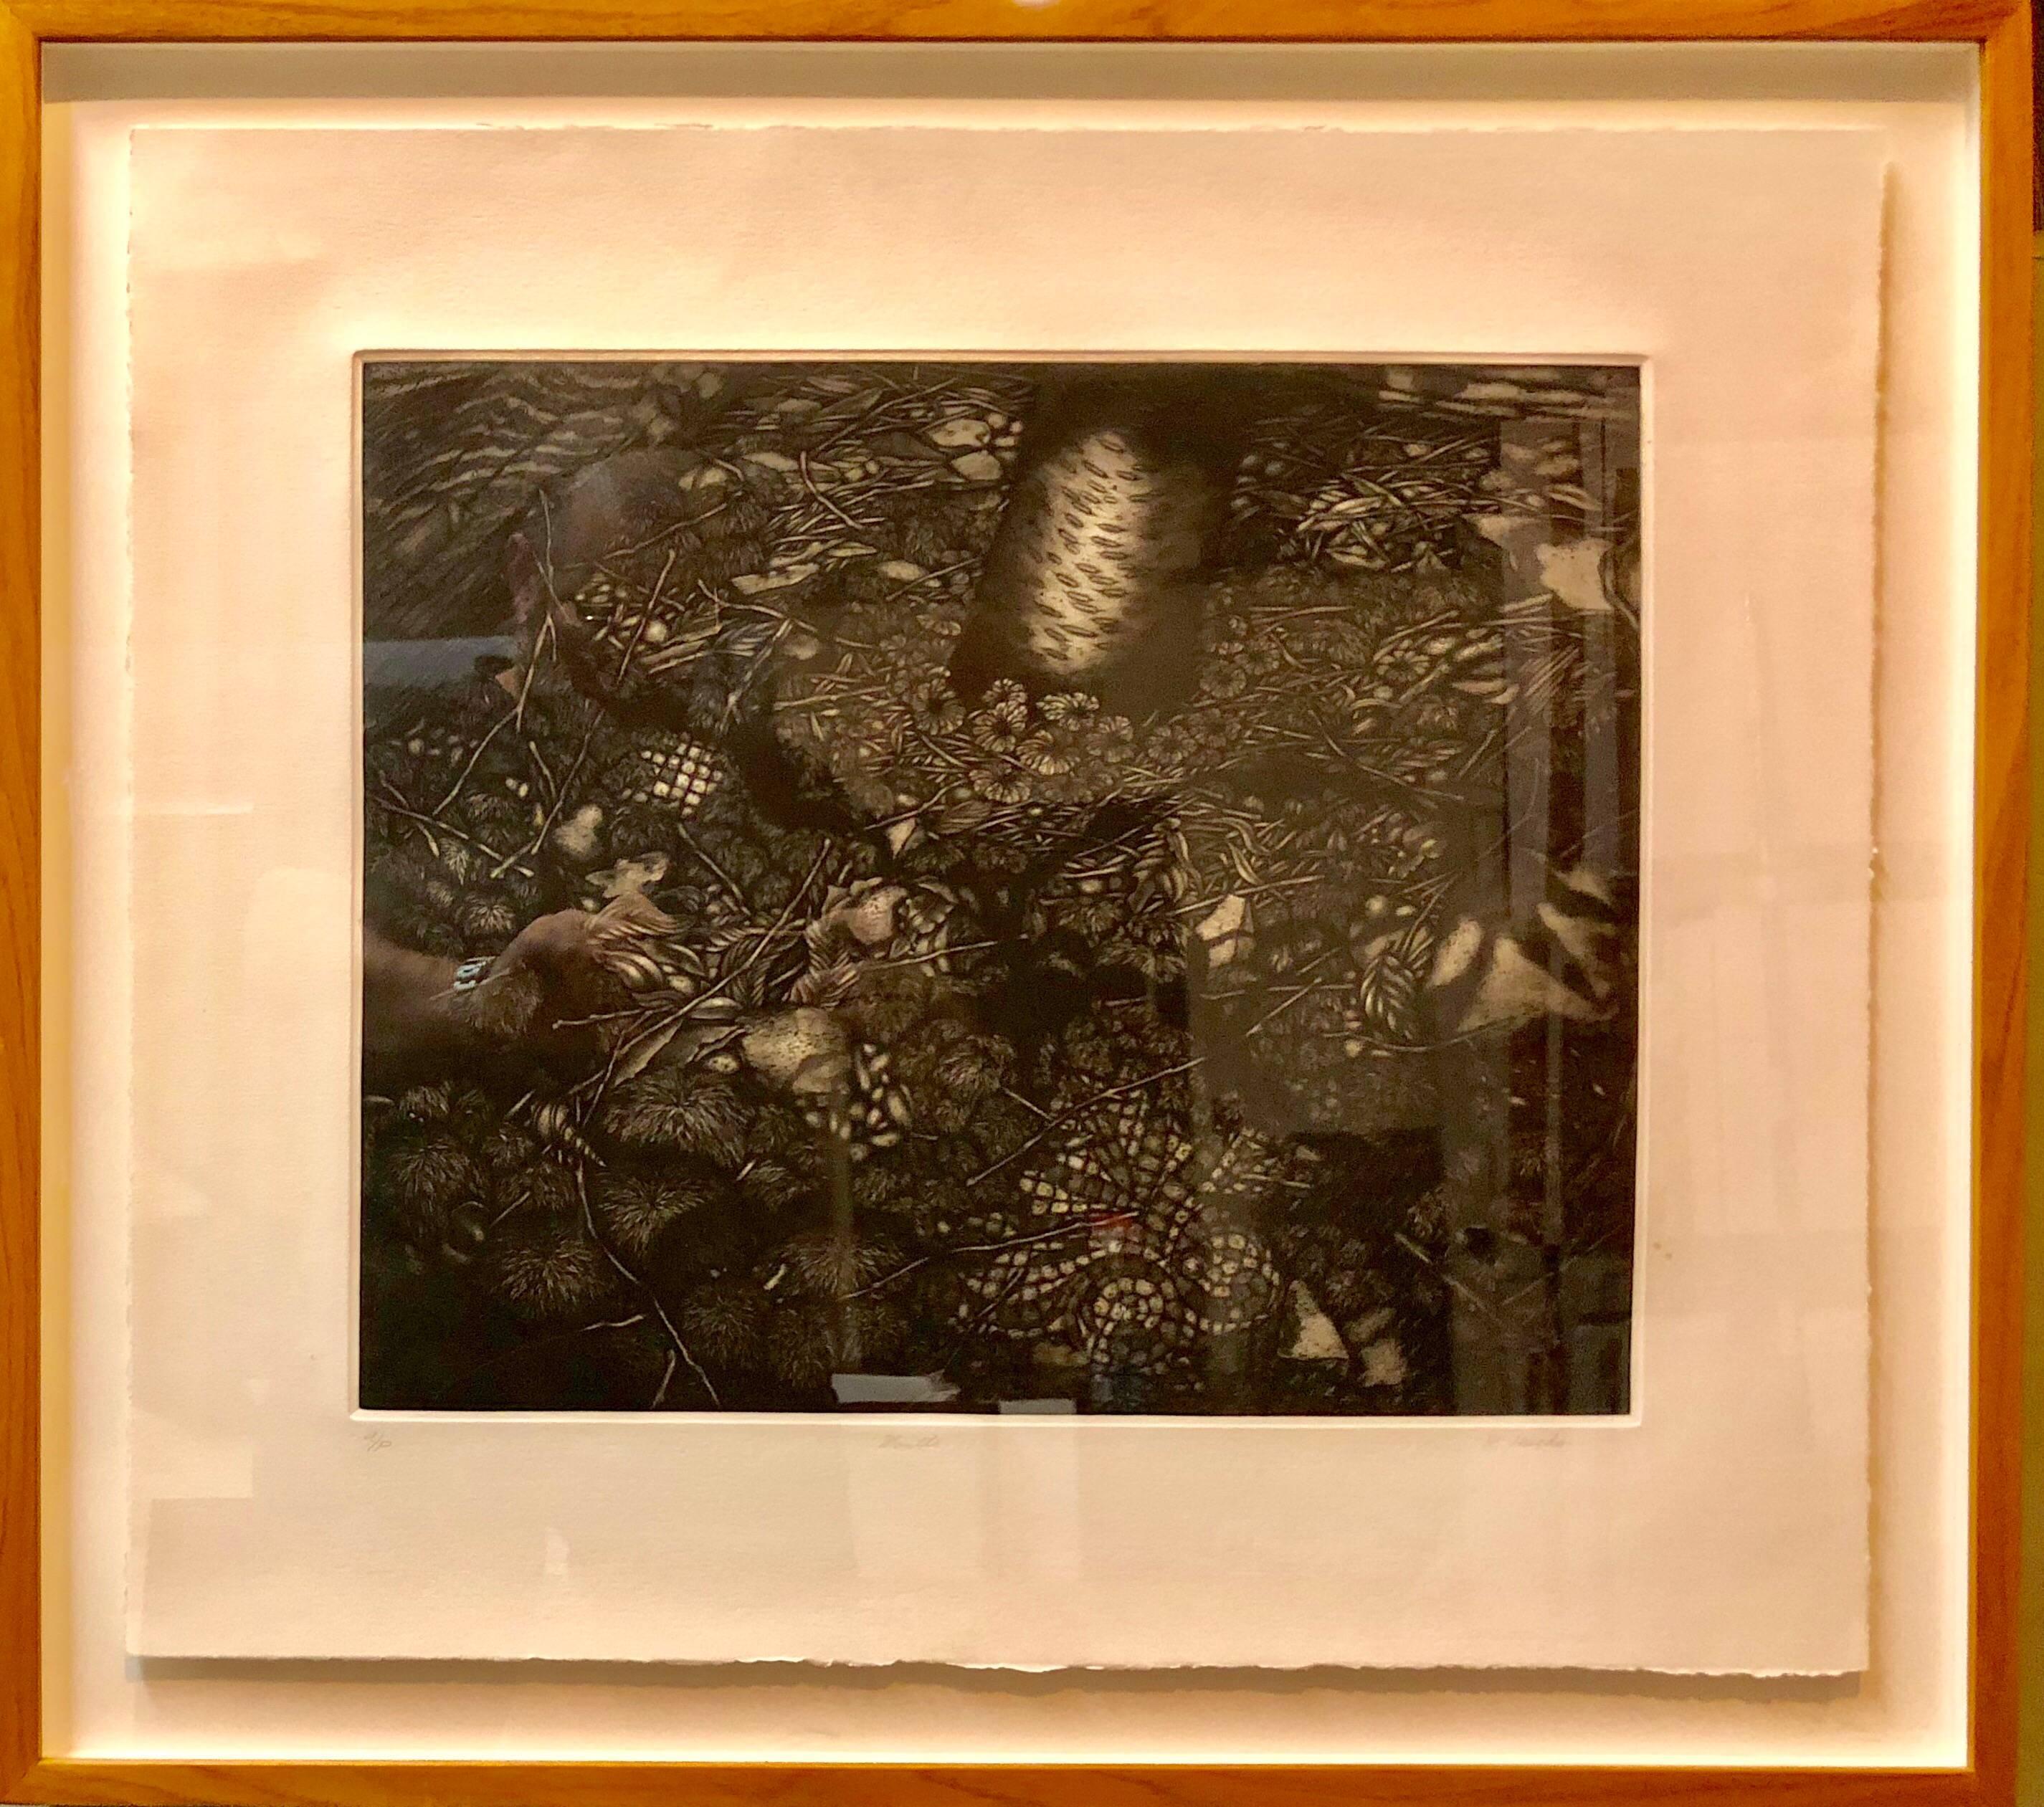 Mezzotint Etching Botanical Print 'Mantle' Signed AP Jungle Image